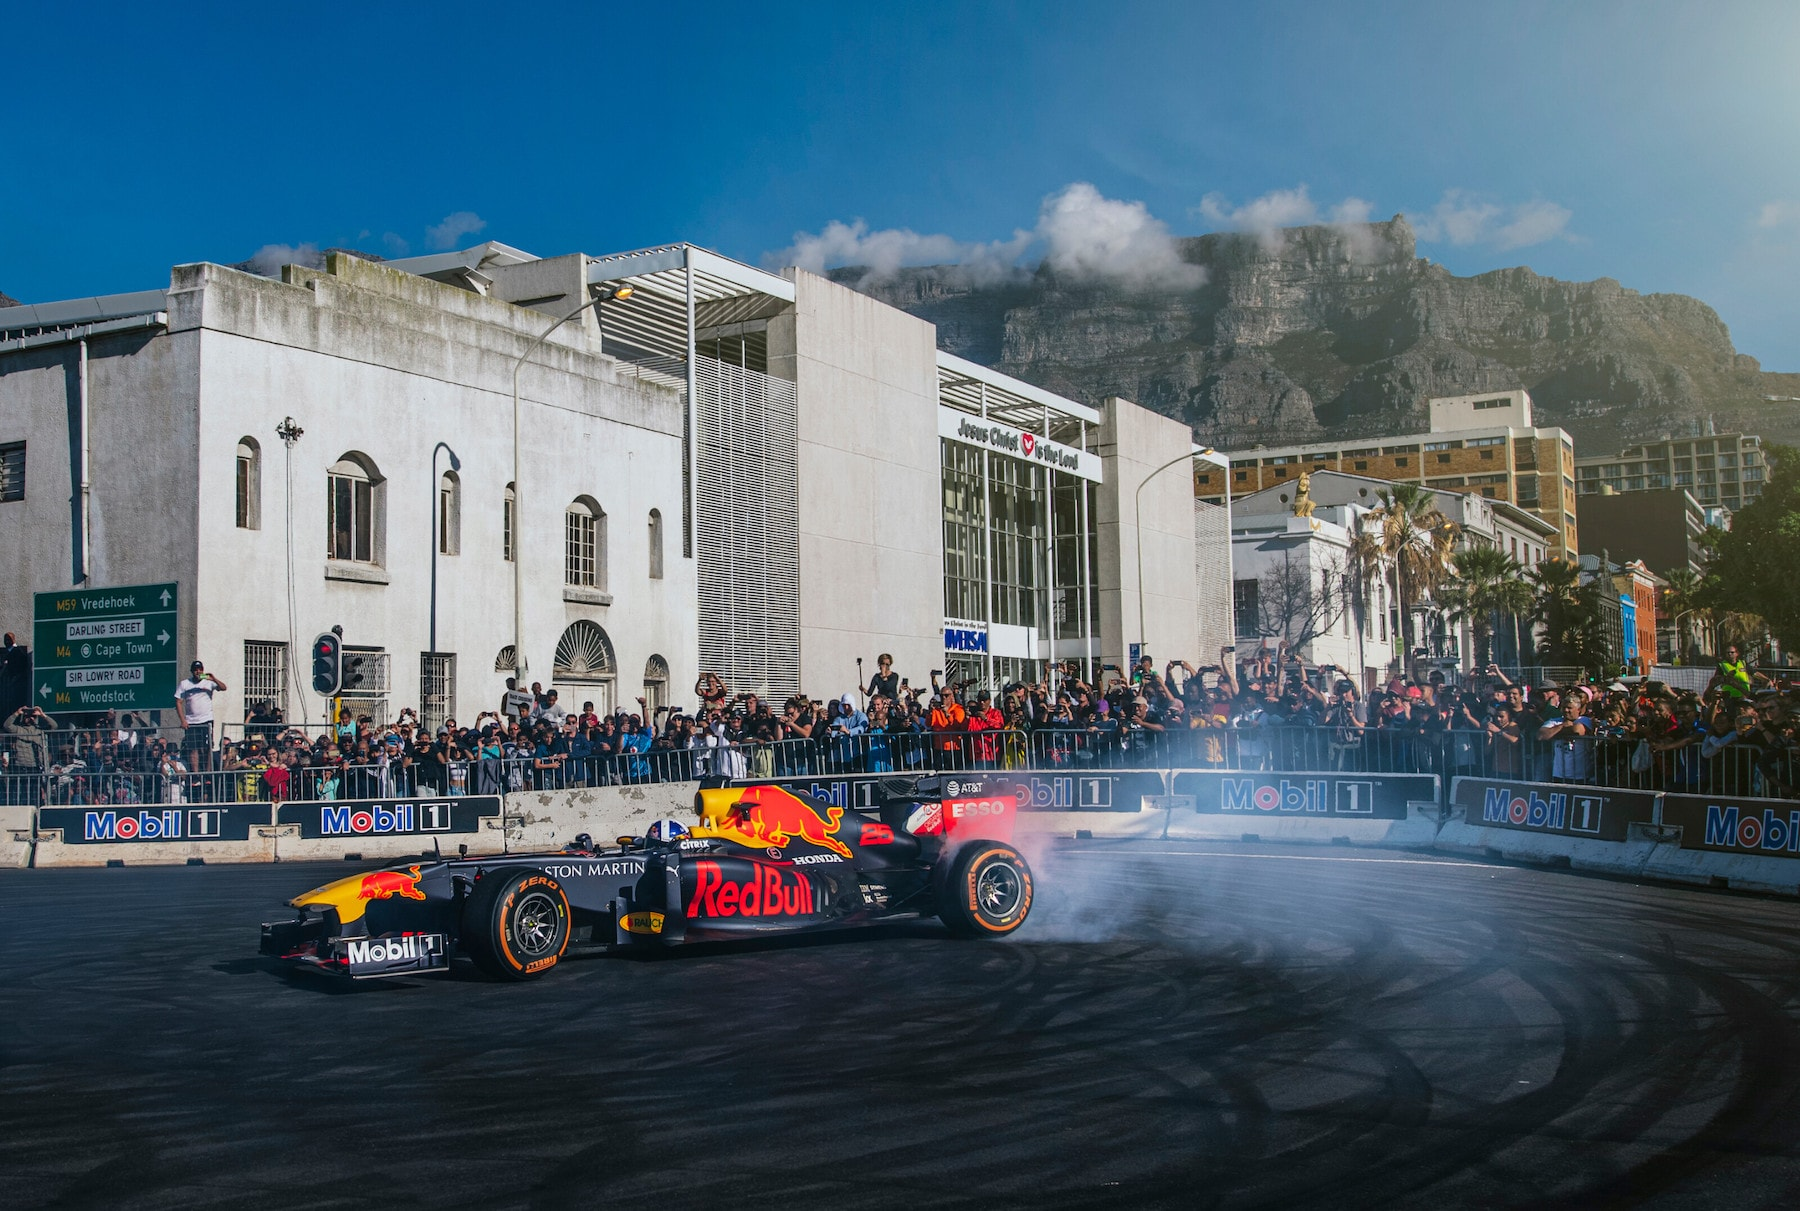 2019 RBR at South Africa 3.jpg